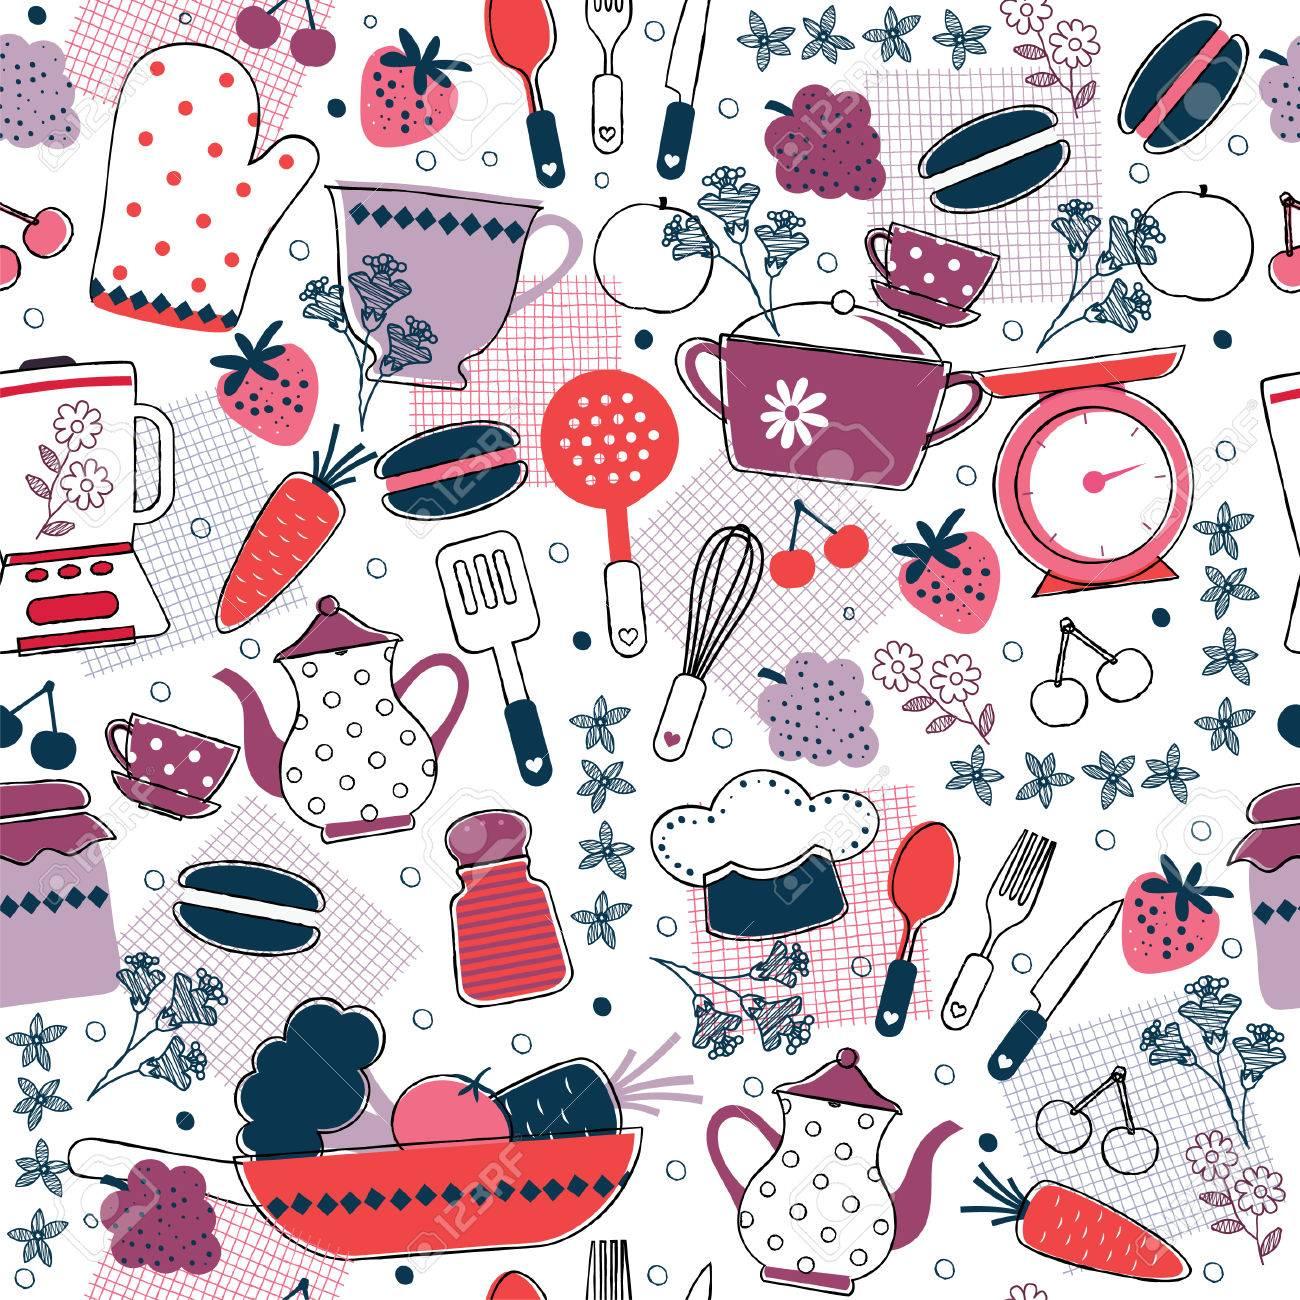 Vettoriale Cucina Senza Soluzione Di Continuita Wallpaper Design Image 33301911